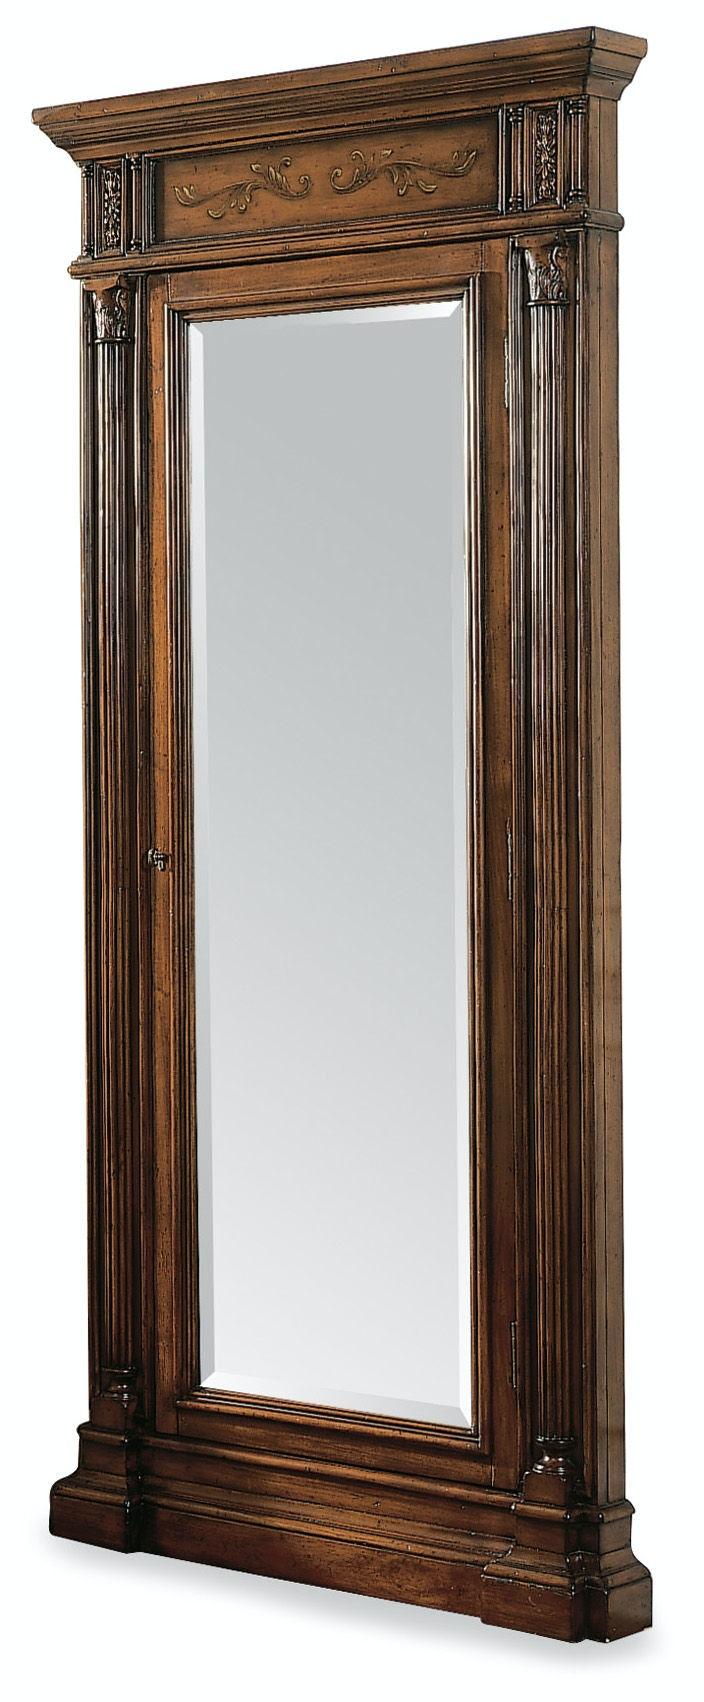 Hooker Furniture Floor Mirror W/Jewelry Armoire Storage 500 50 558